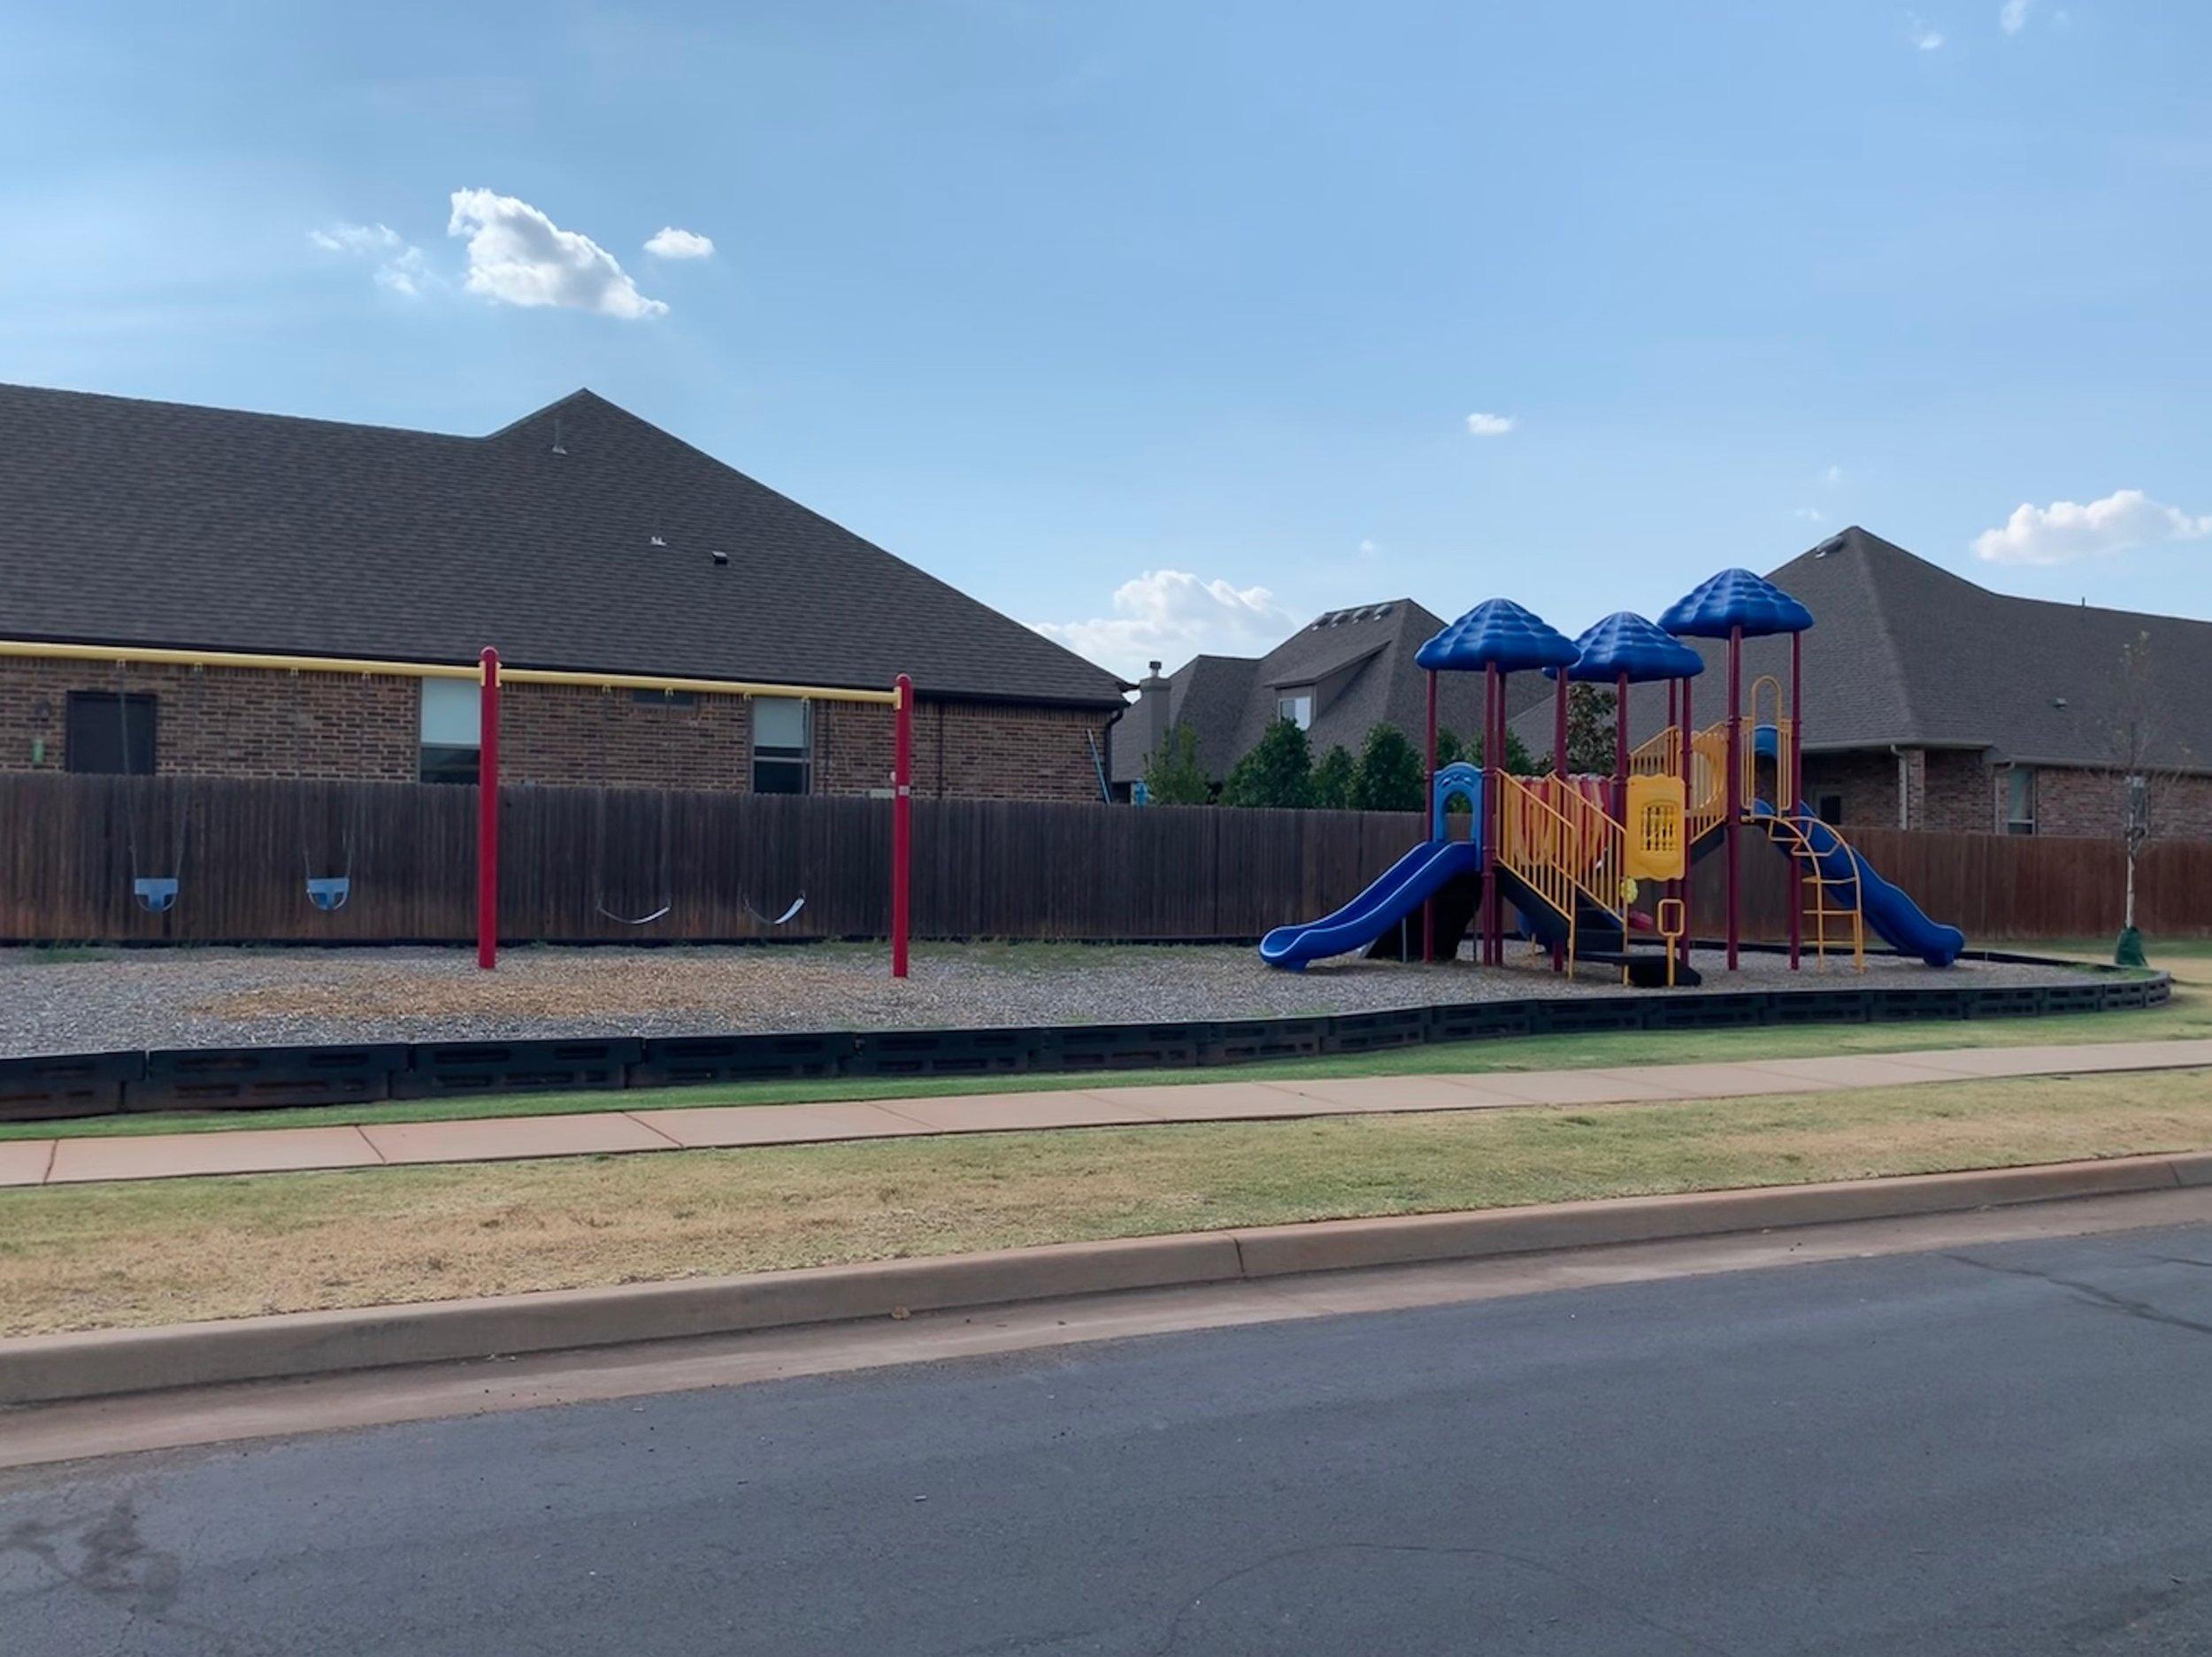 Neighborhood play park.